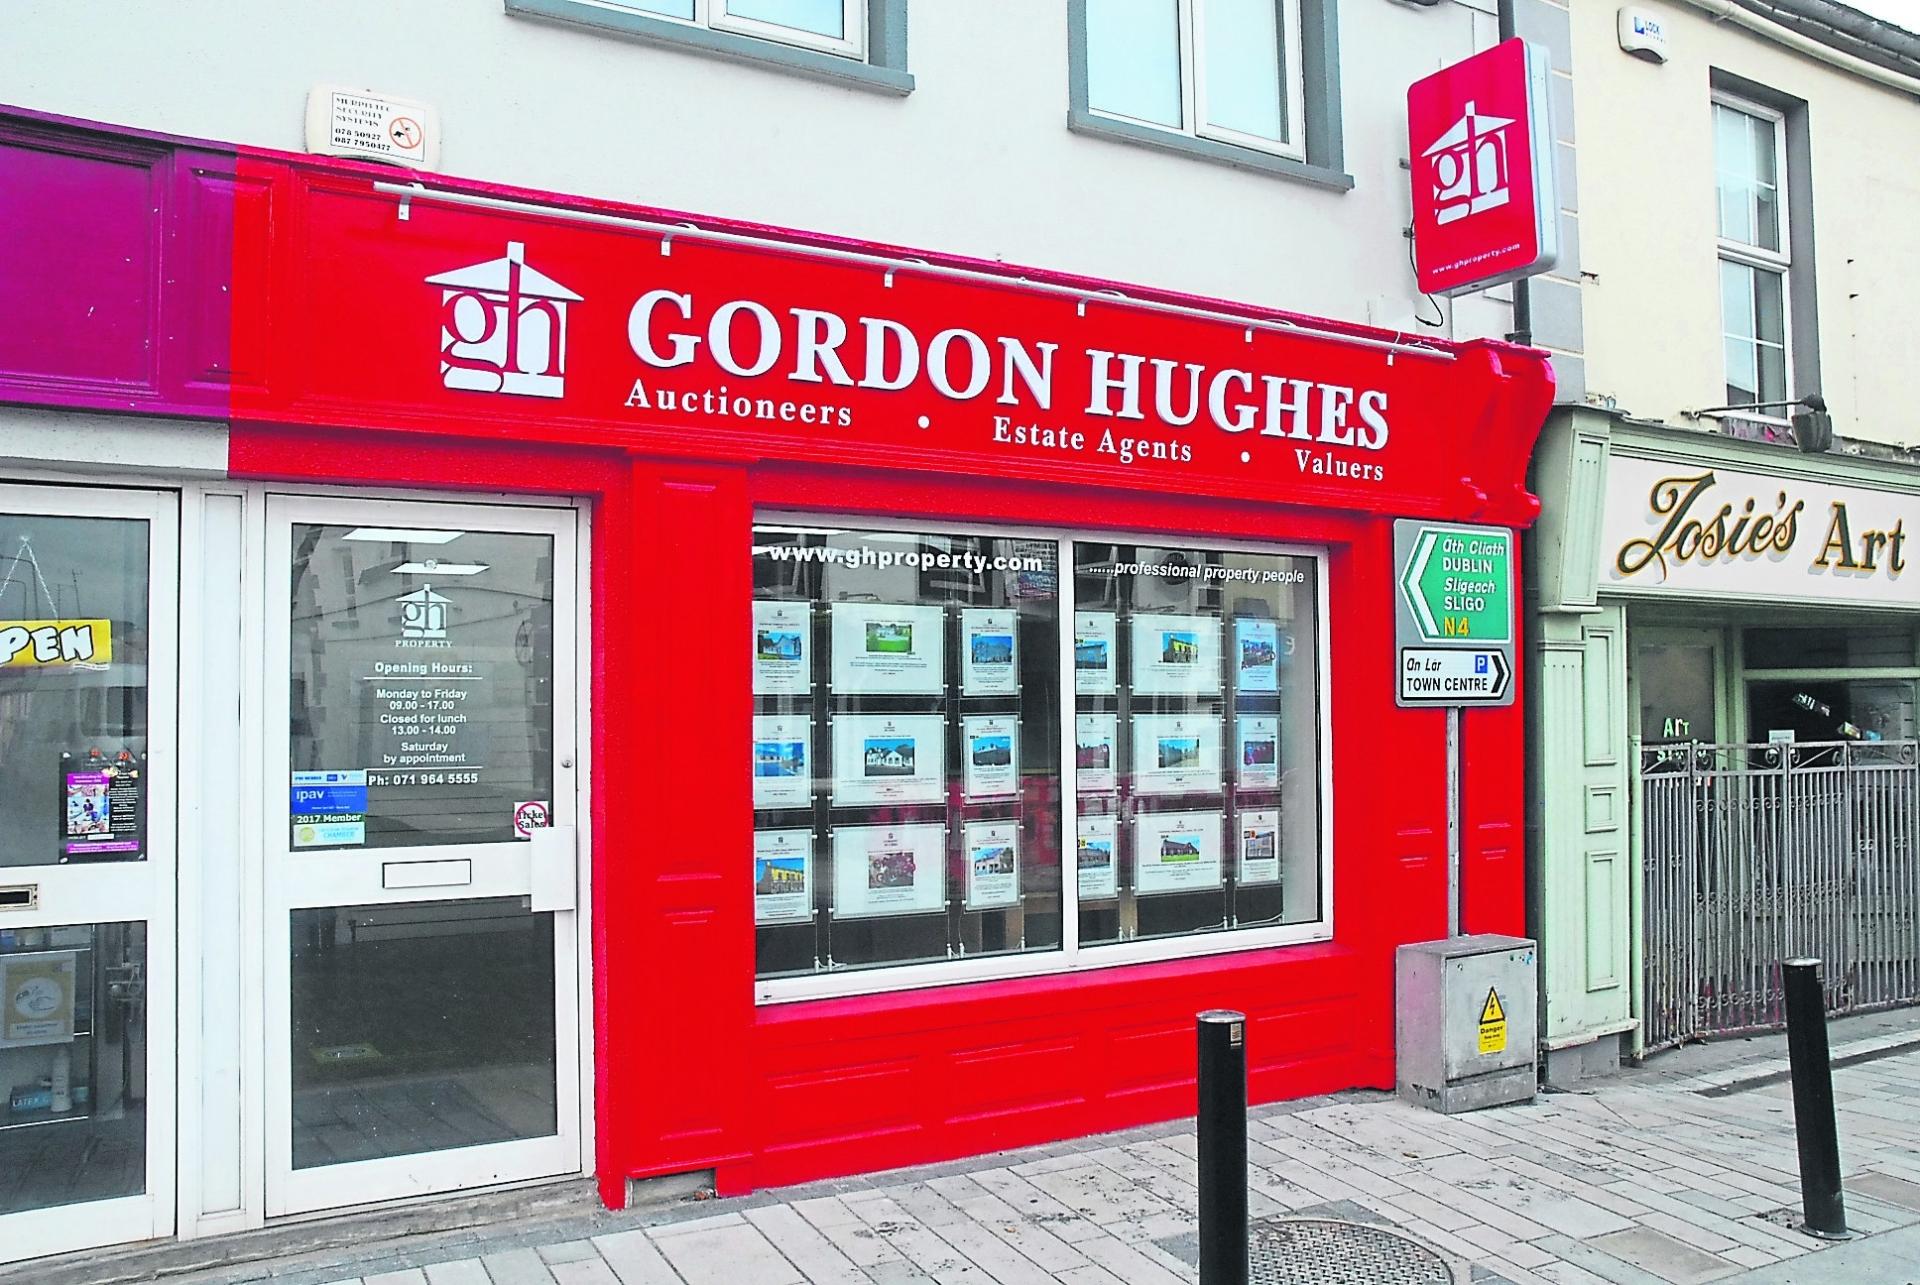 Gordon Hughes Estate Agents Carrick-on-Shannon